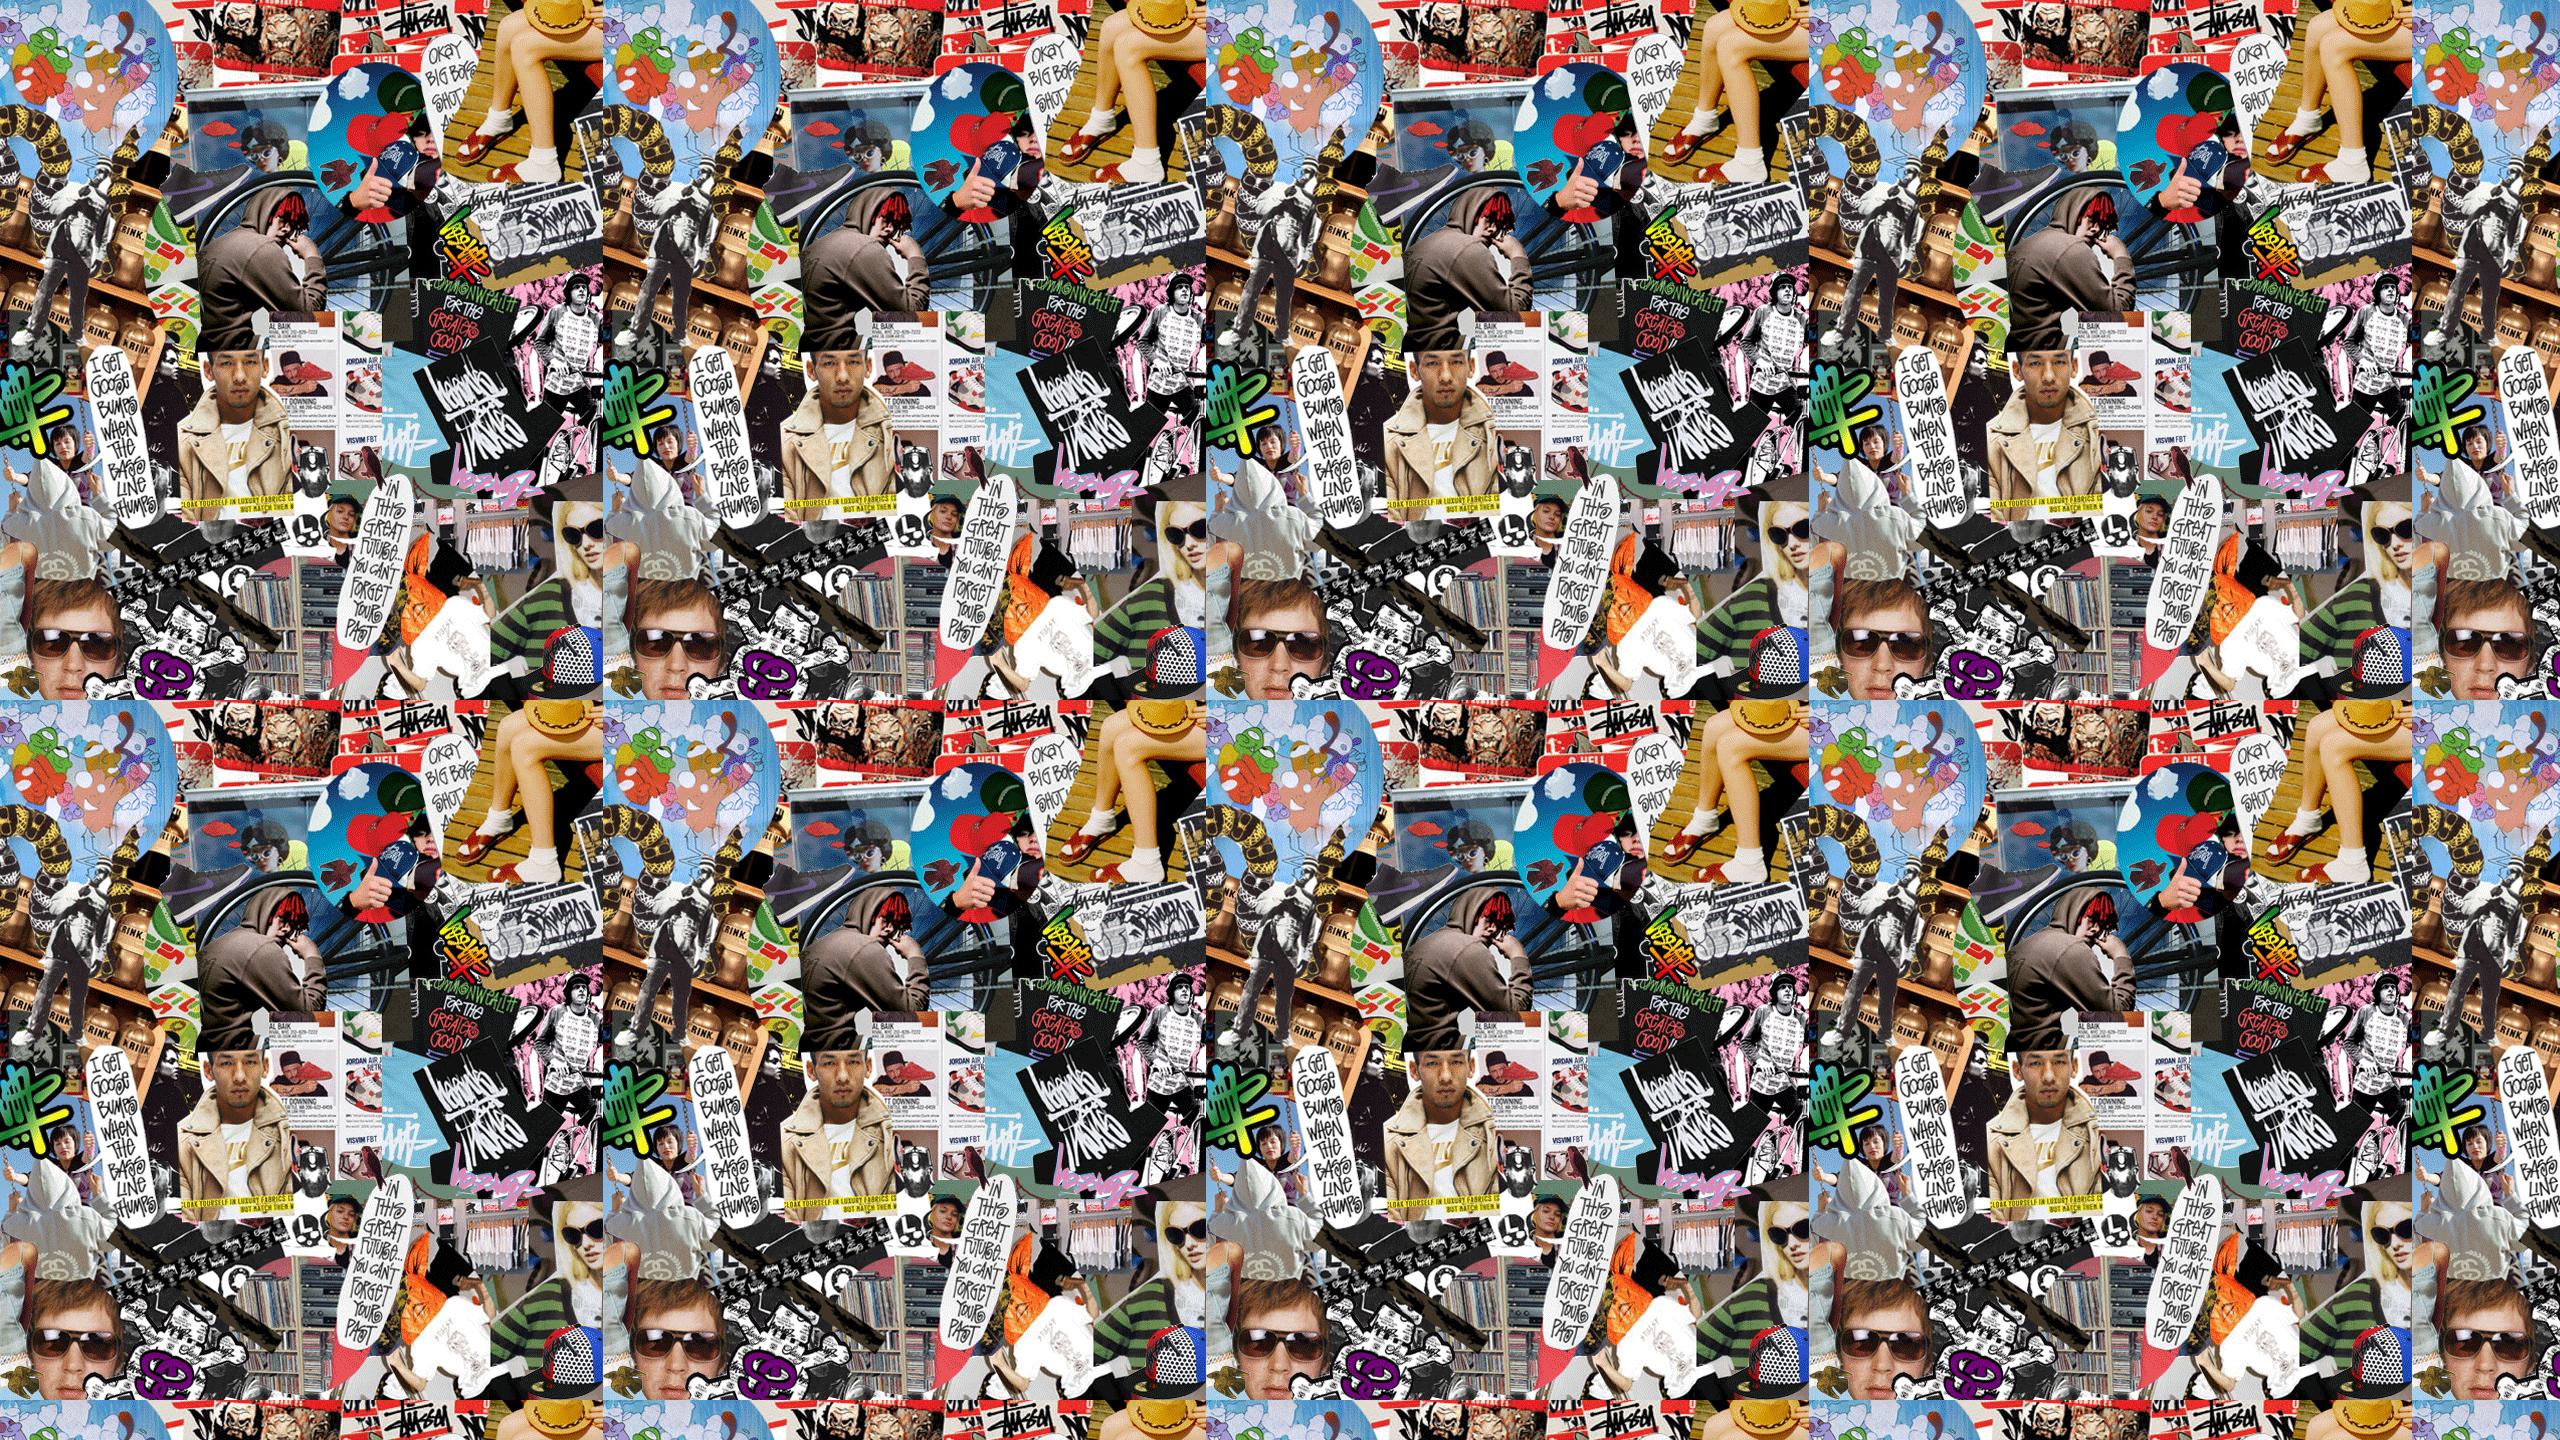 80s Wallpaper 2560x1440